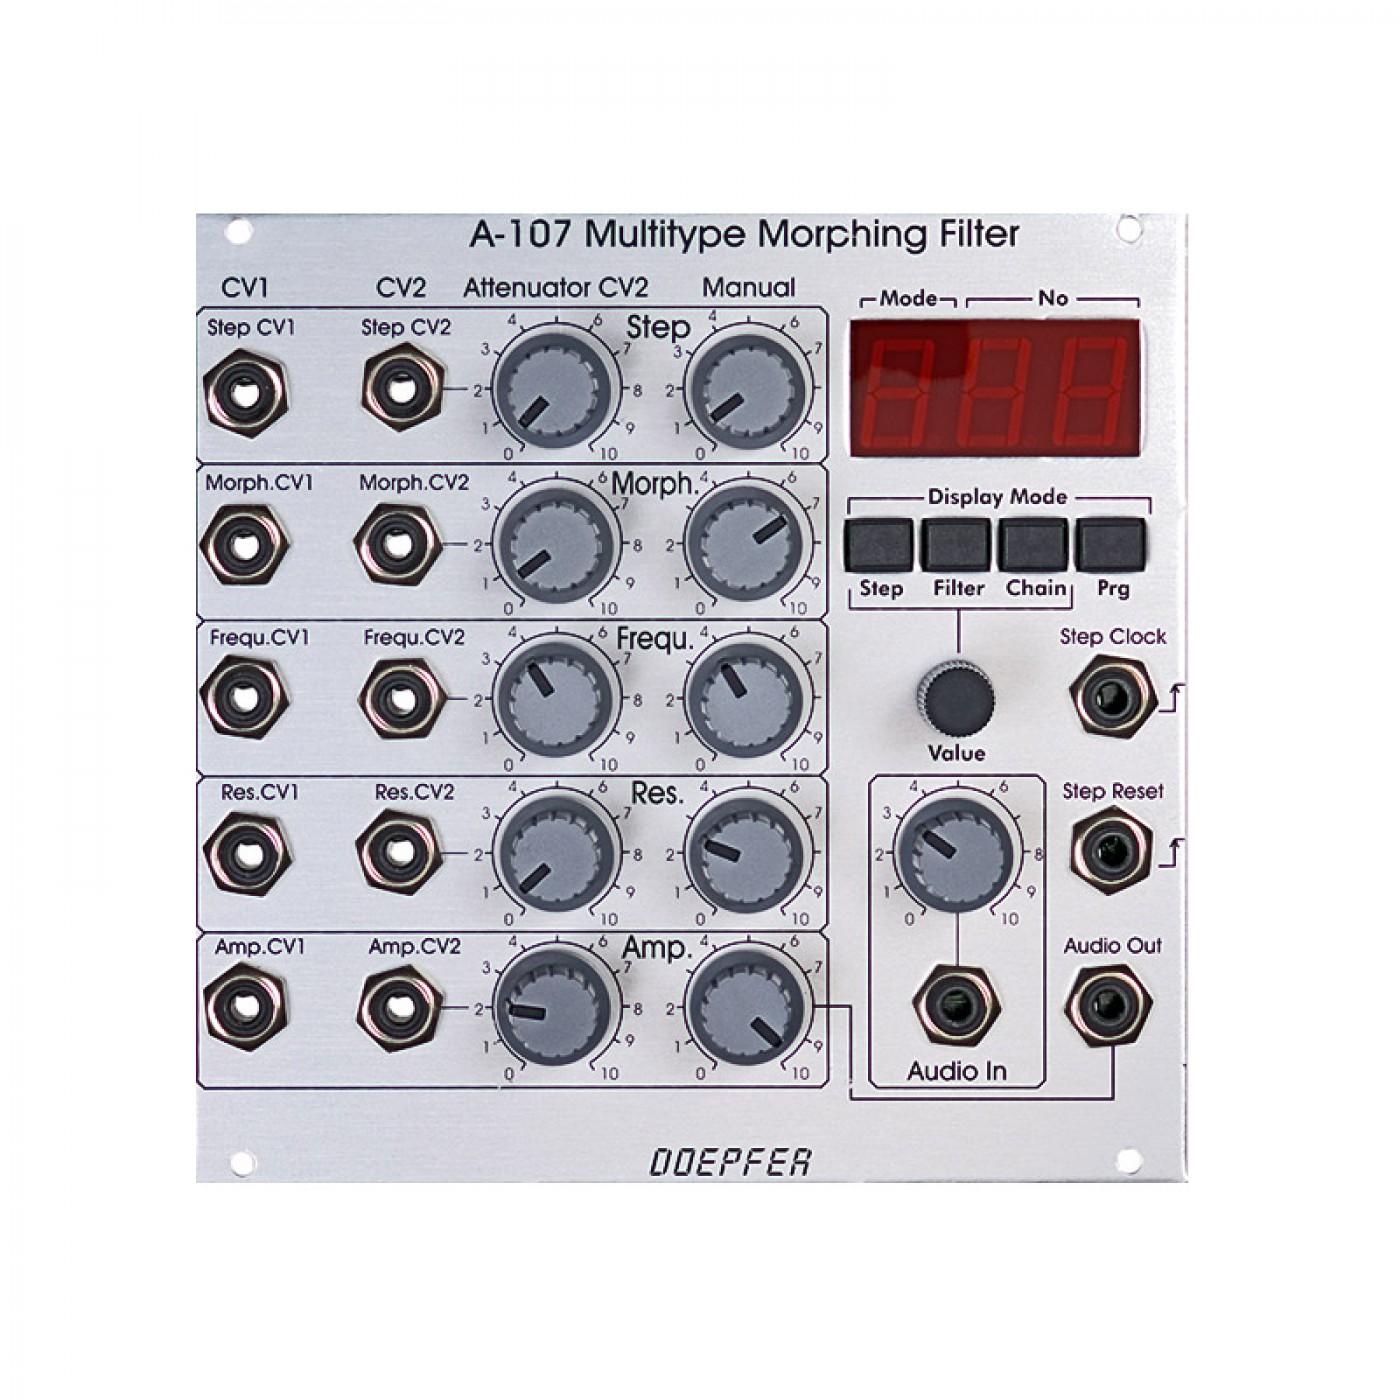 Doepfer A-107 Multitype Morphing Filter